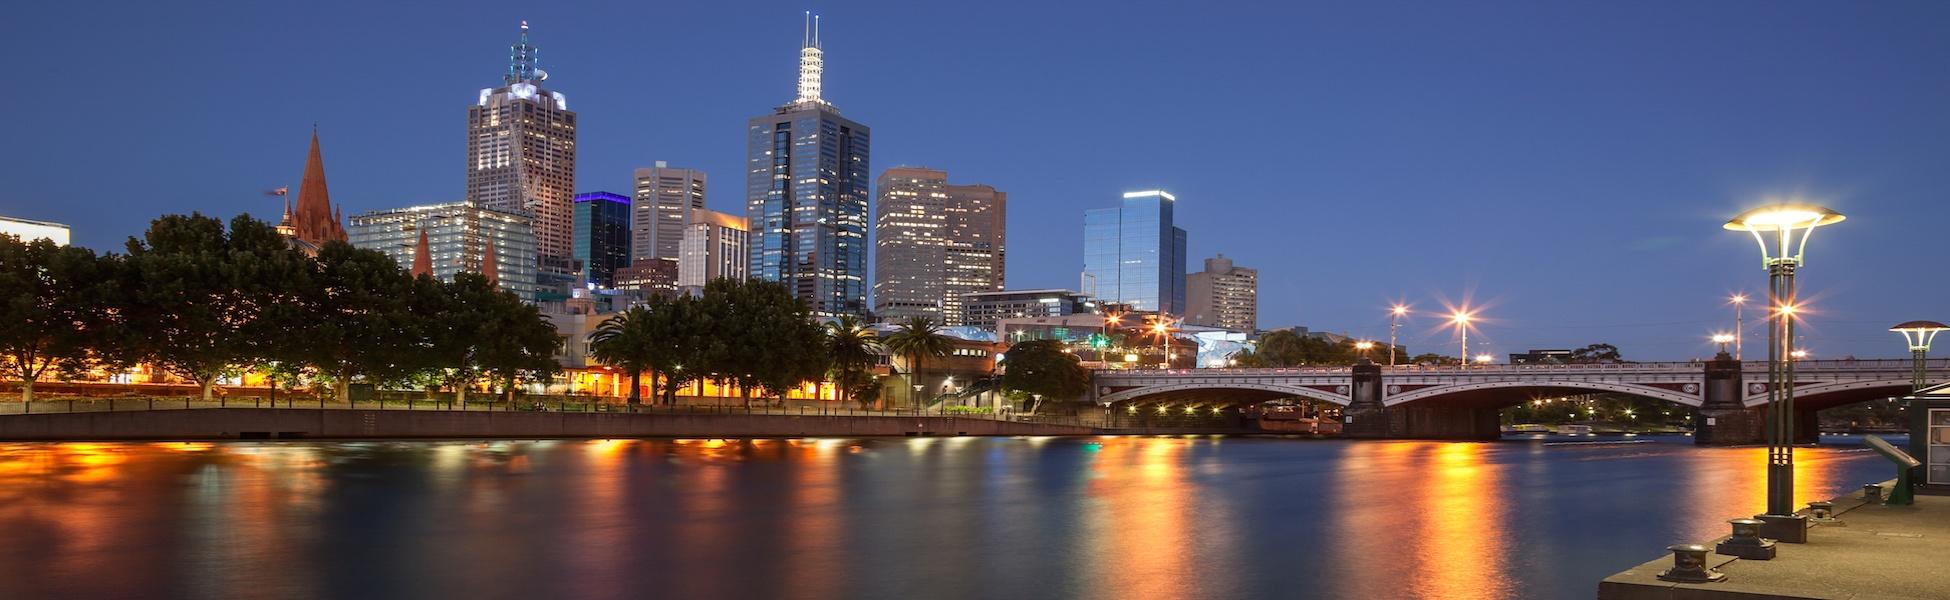 MELBOURNE_CITY.jpg